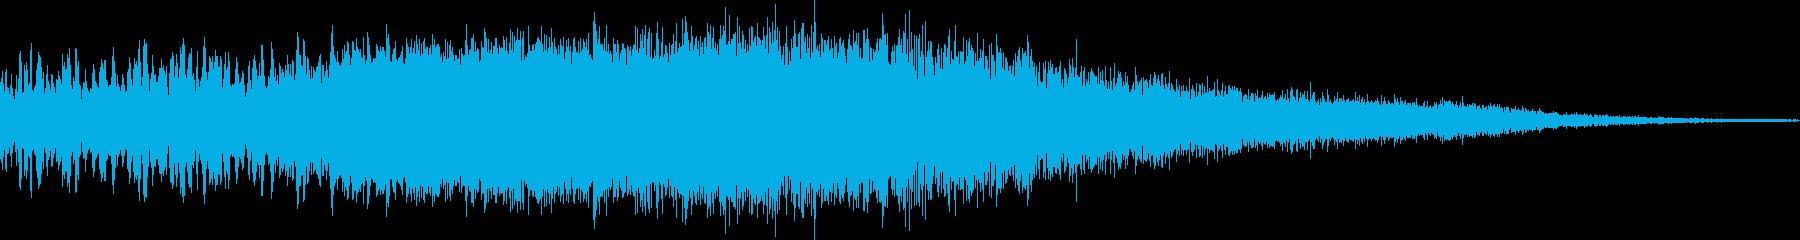 AMGアナログFX 11の再生済みの波形